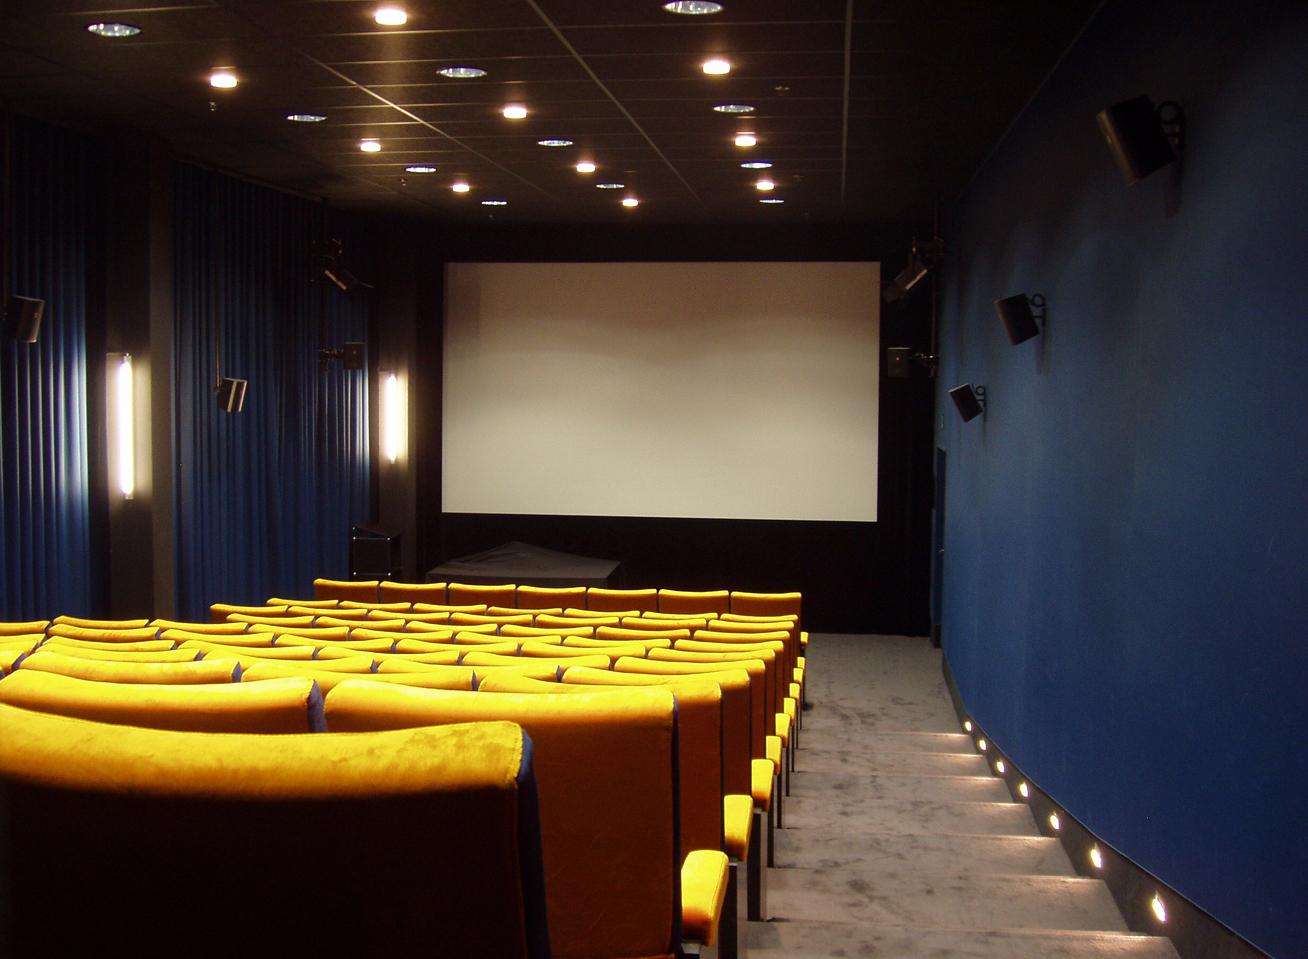 kino-bourbaki-1.jpg